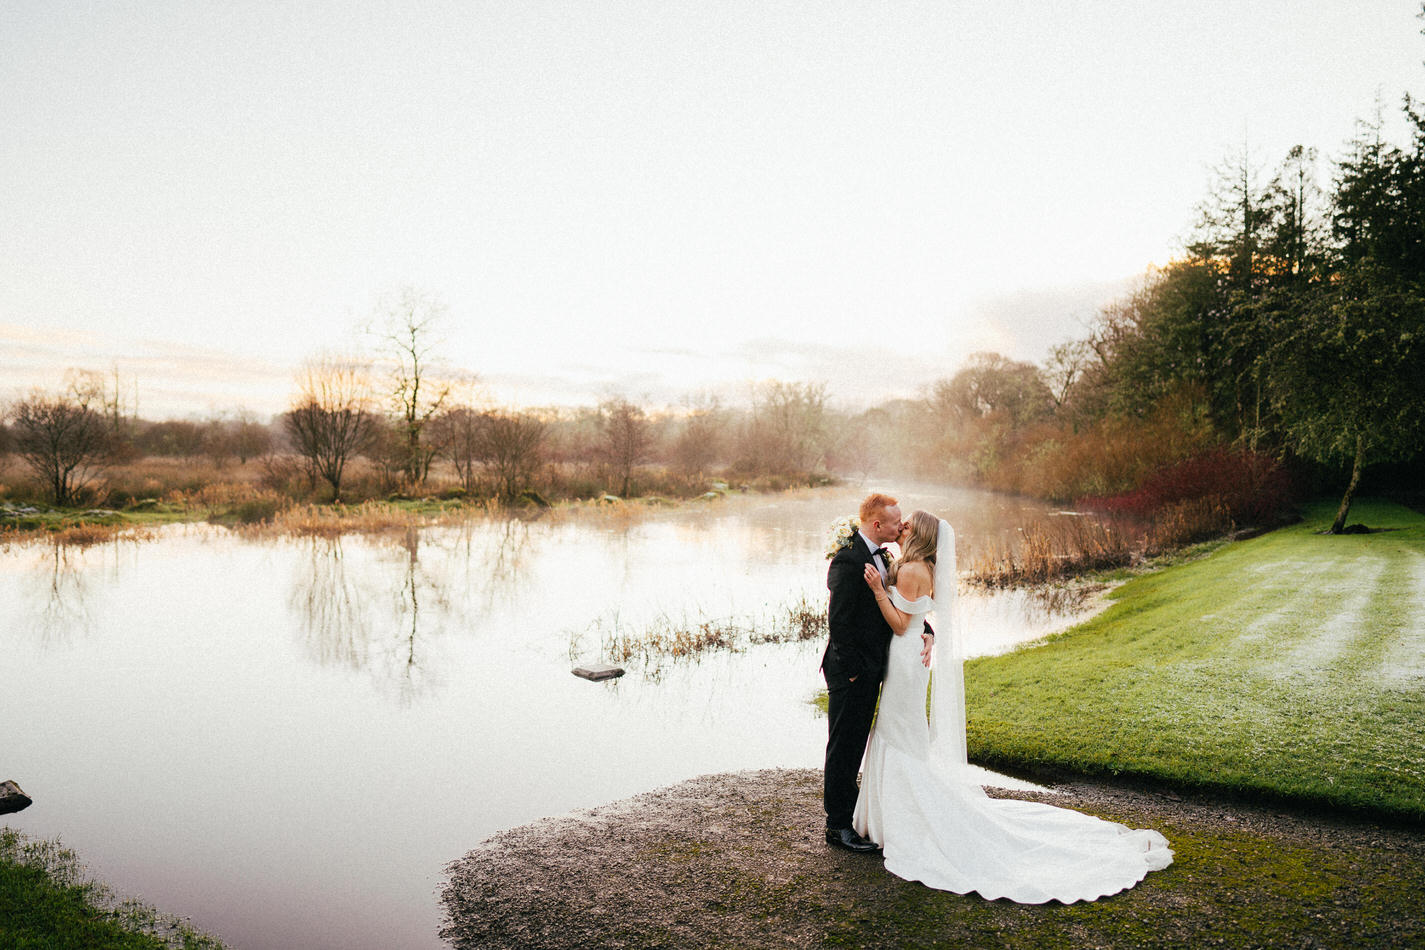 Castle-wedding-ireland-photos- 0223 163